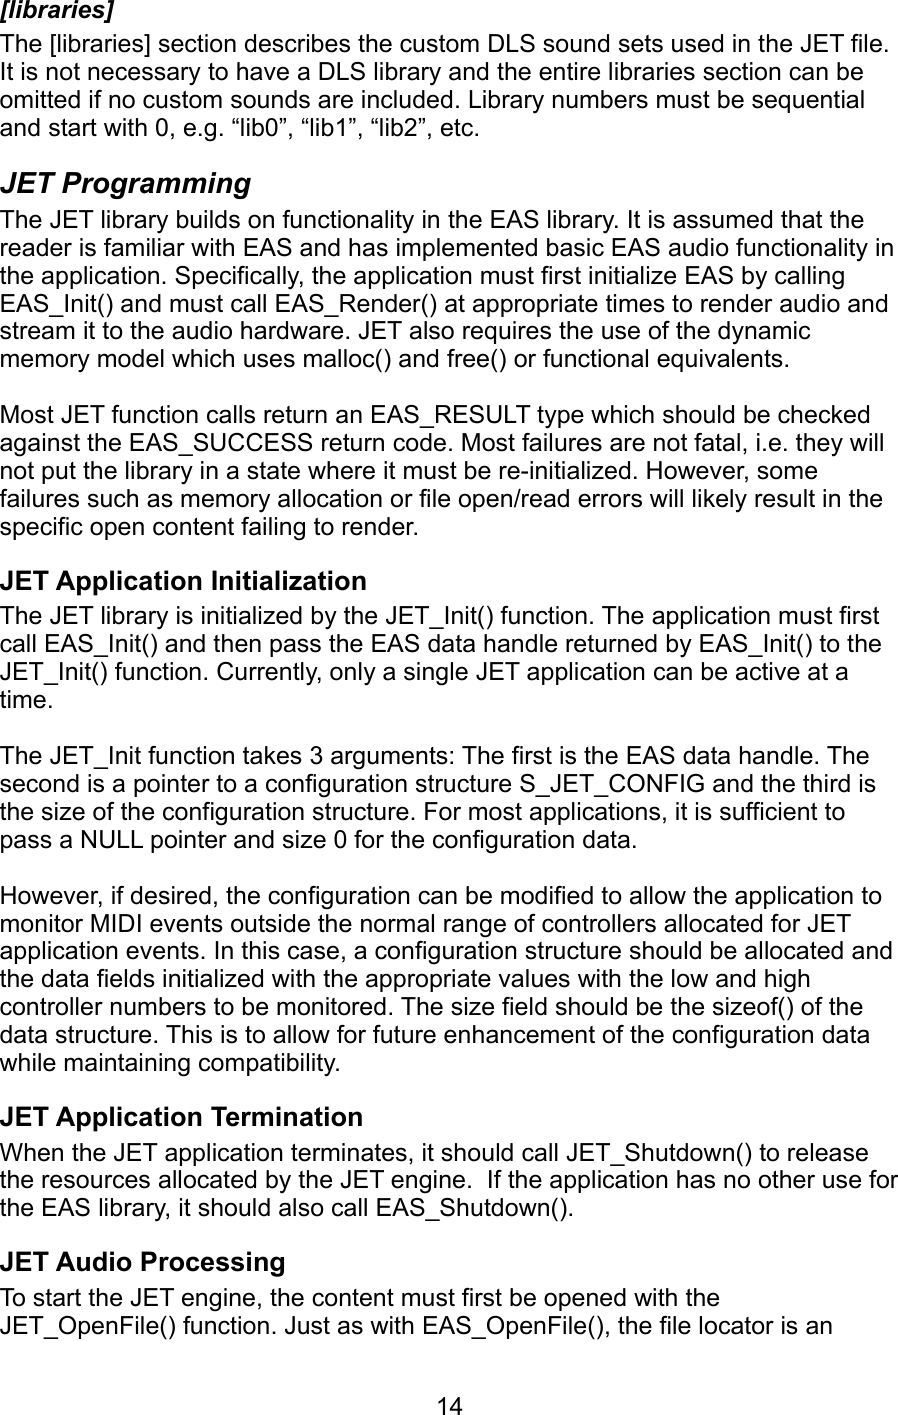 Sonic Network JET Programming Manual